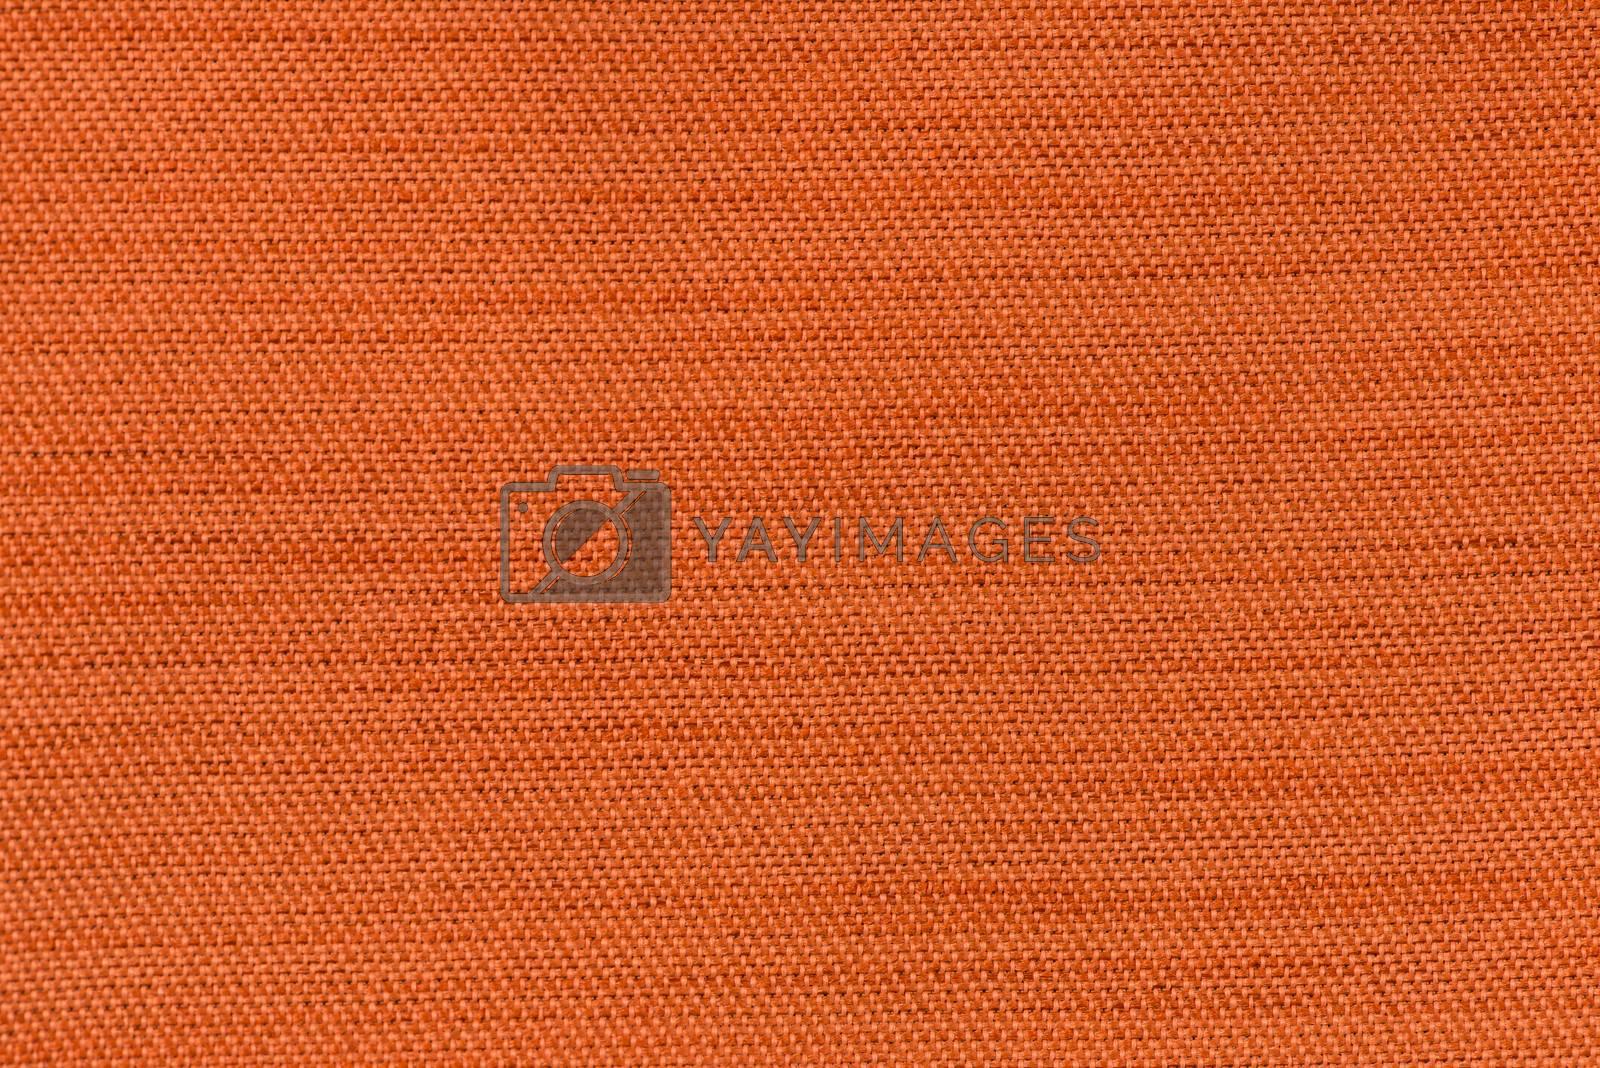 Orange fabric by homydesign